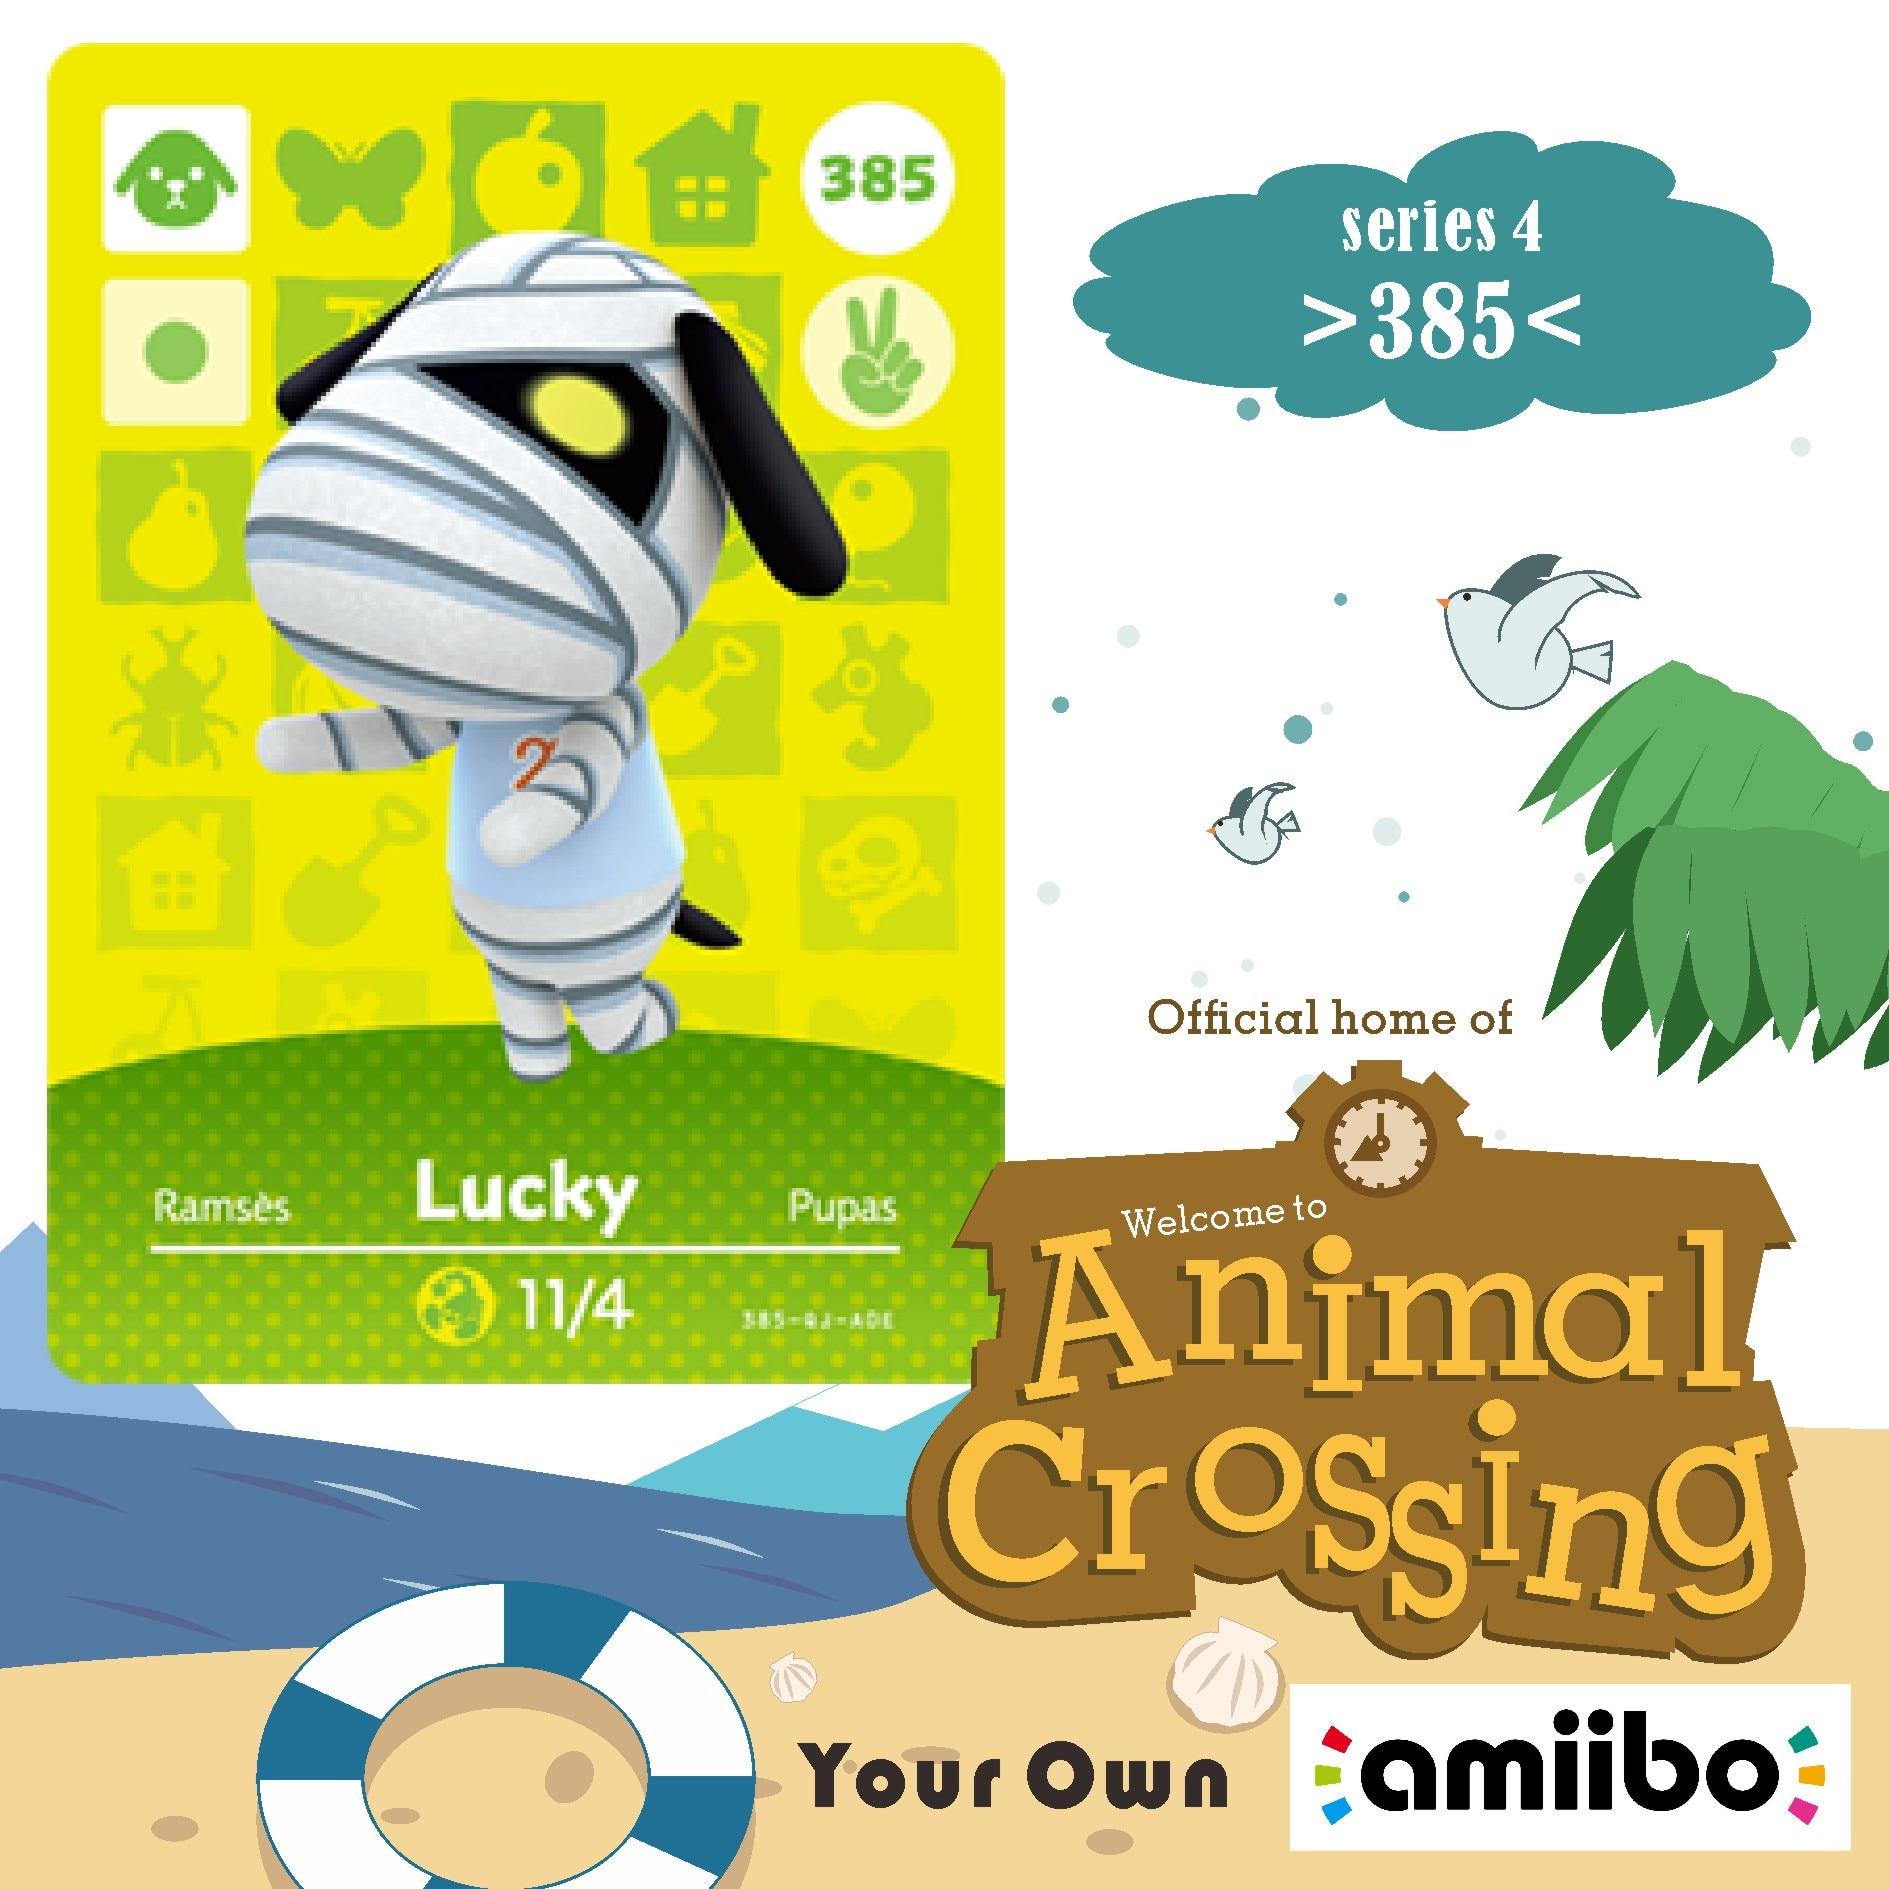 385 Lucky Amiibo Animal Crossing Series 3 Animal Crossing Amiibo Card Work For Ns Games Amiibo Nfc Card Dropshipping